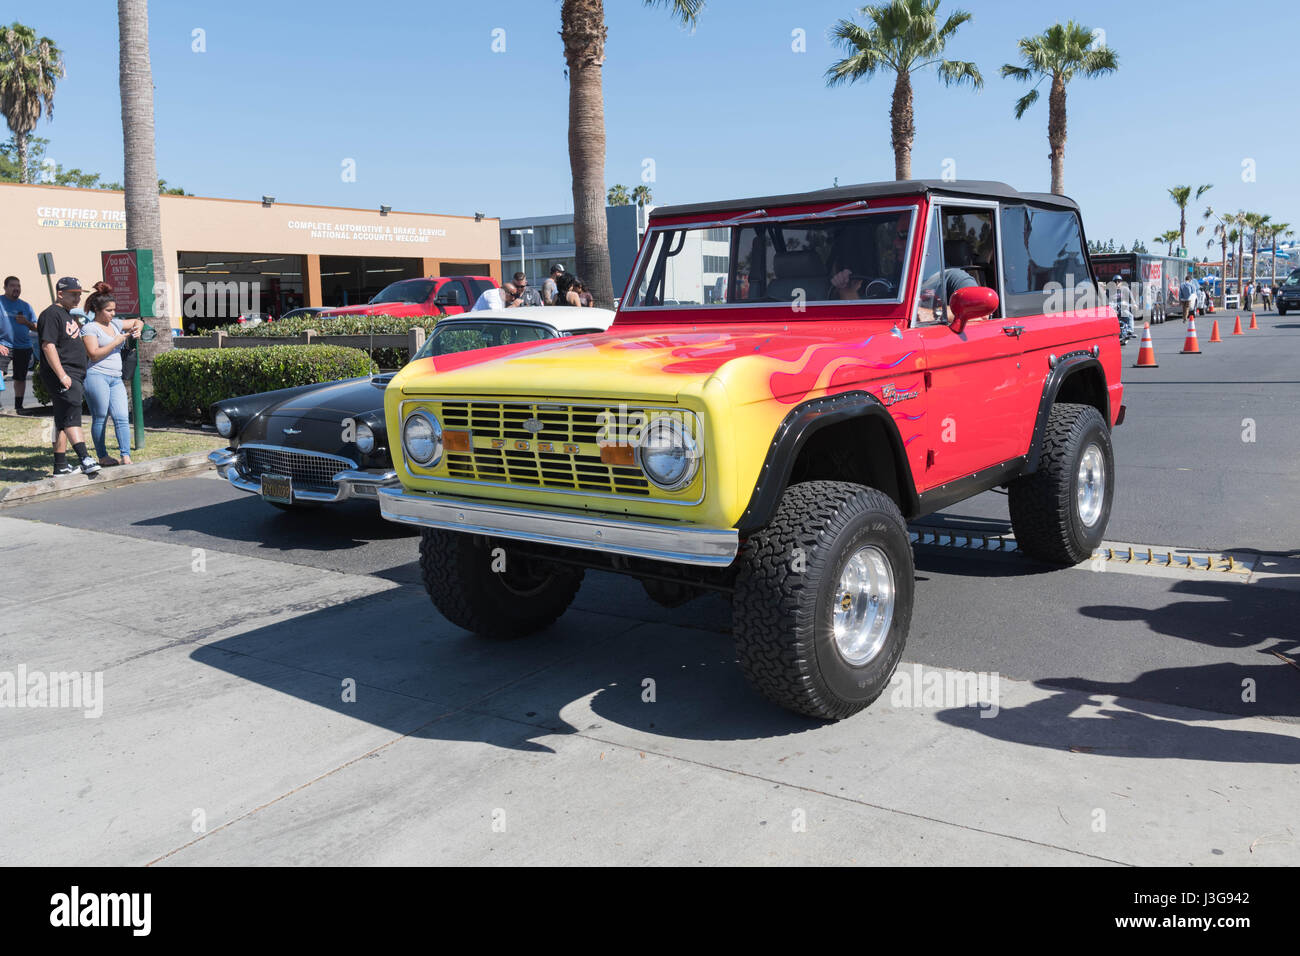 2017 Ford Bronco >> Buena Park Usa April 30 2017 Ford Bronco On Display